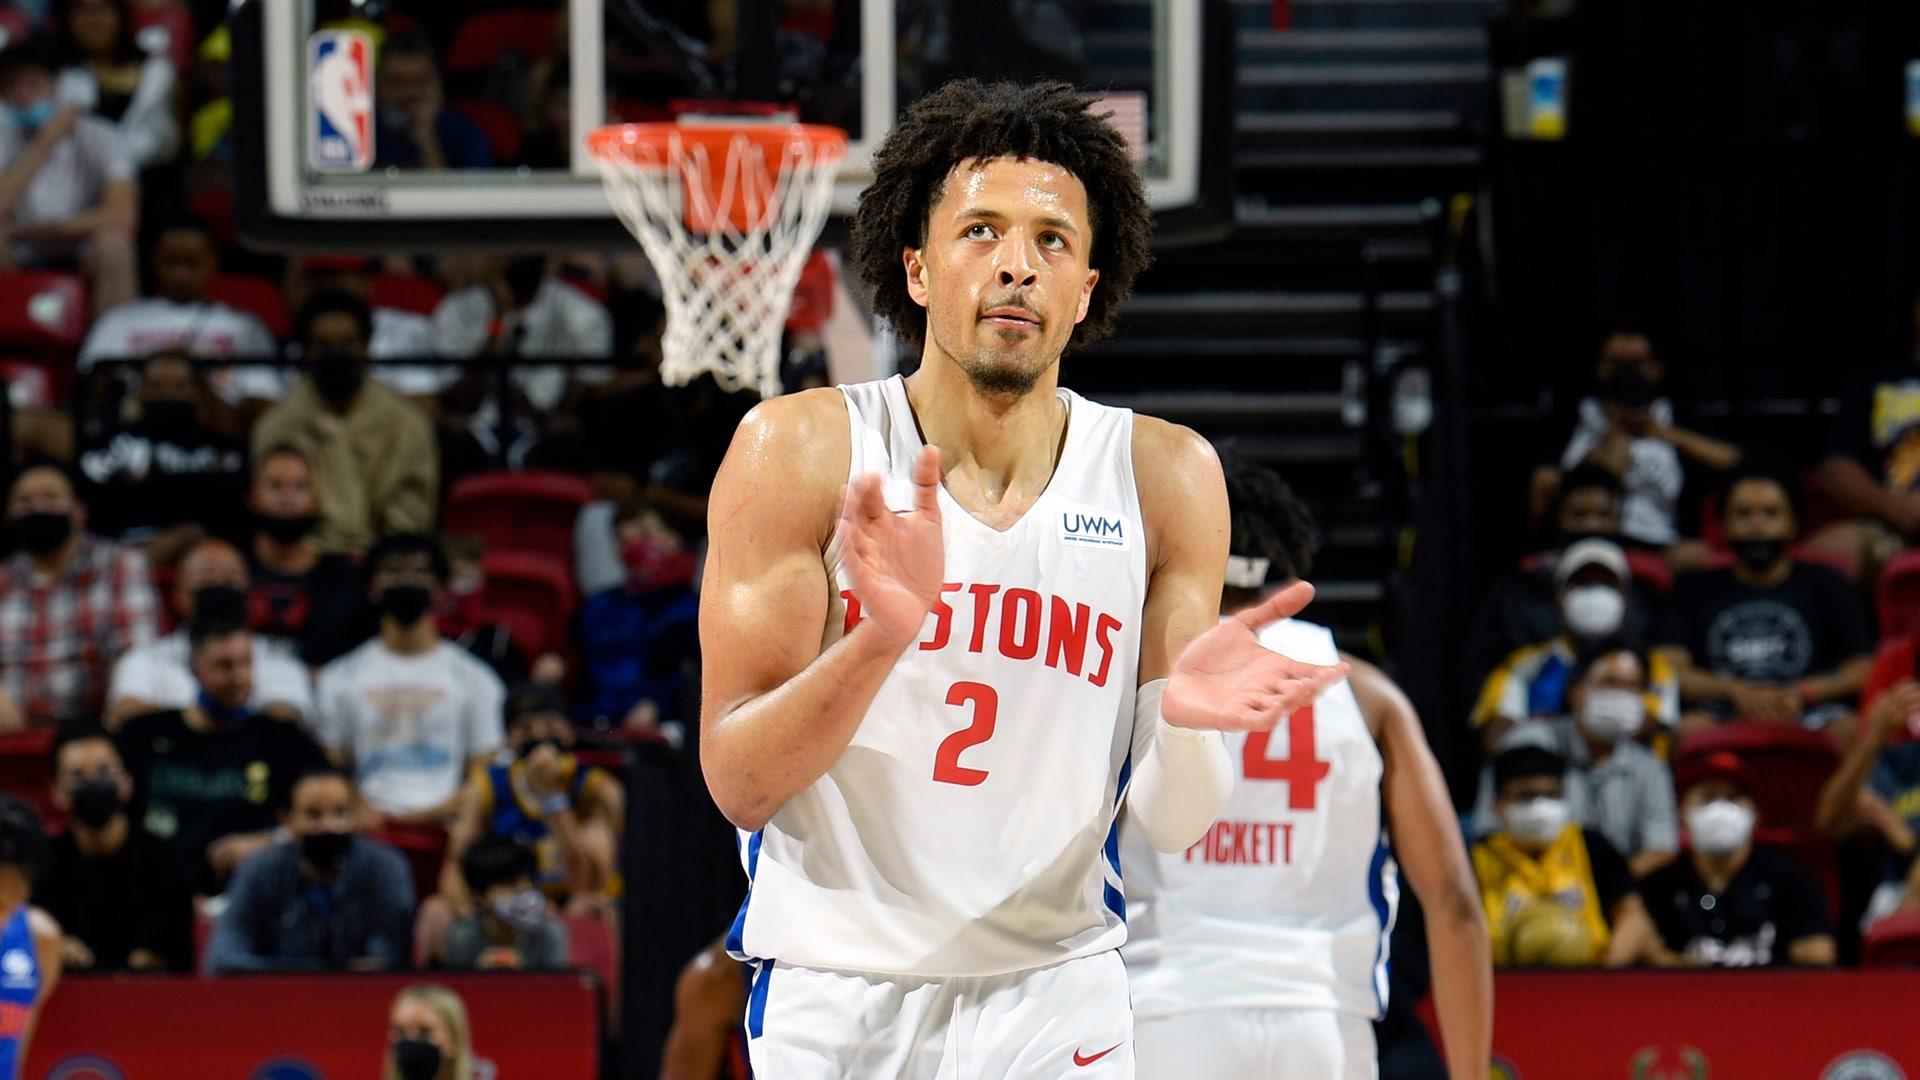 Las Vegas Summer League: Cade Cunningham helps Pistons hold off Knicks